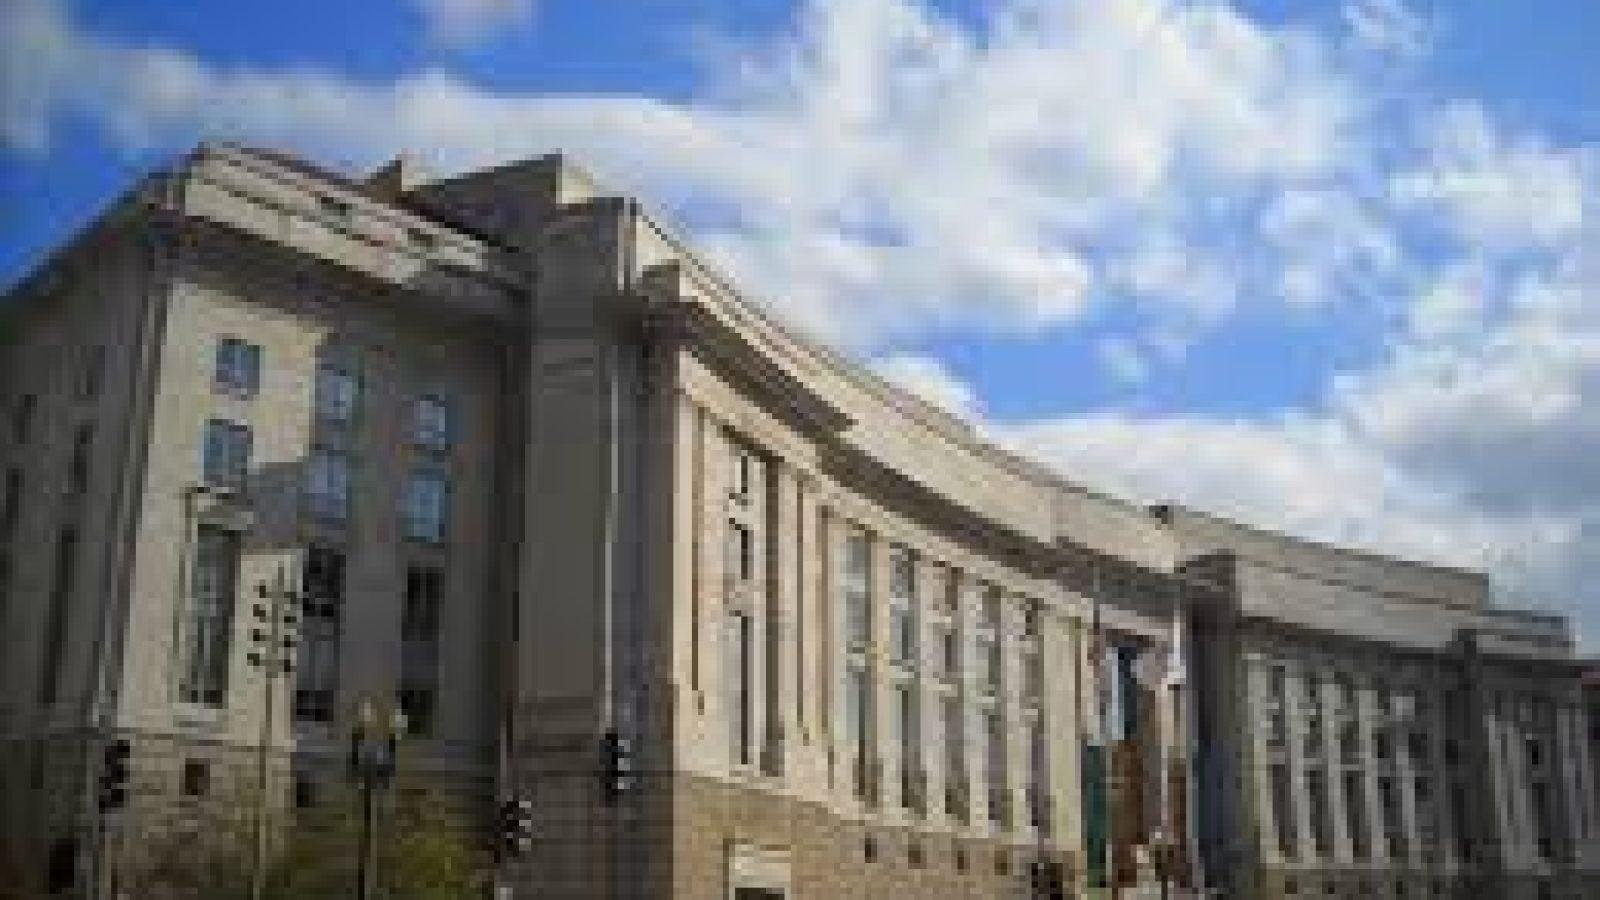 USAID Main Building - Ronald Reagan Building